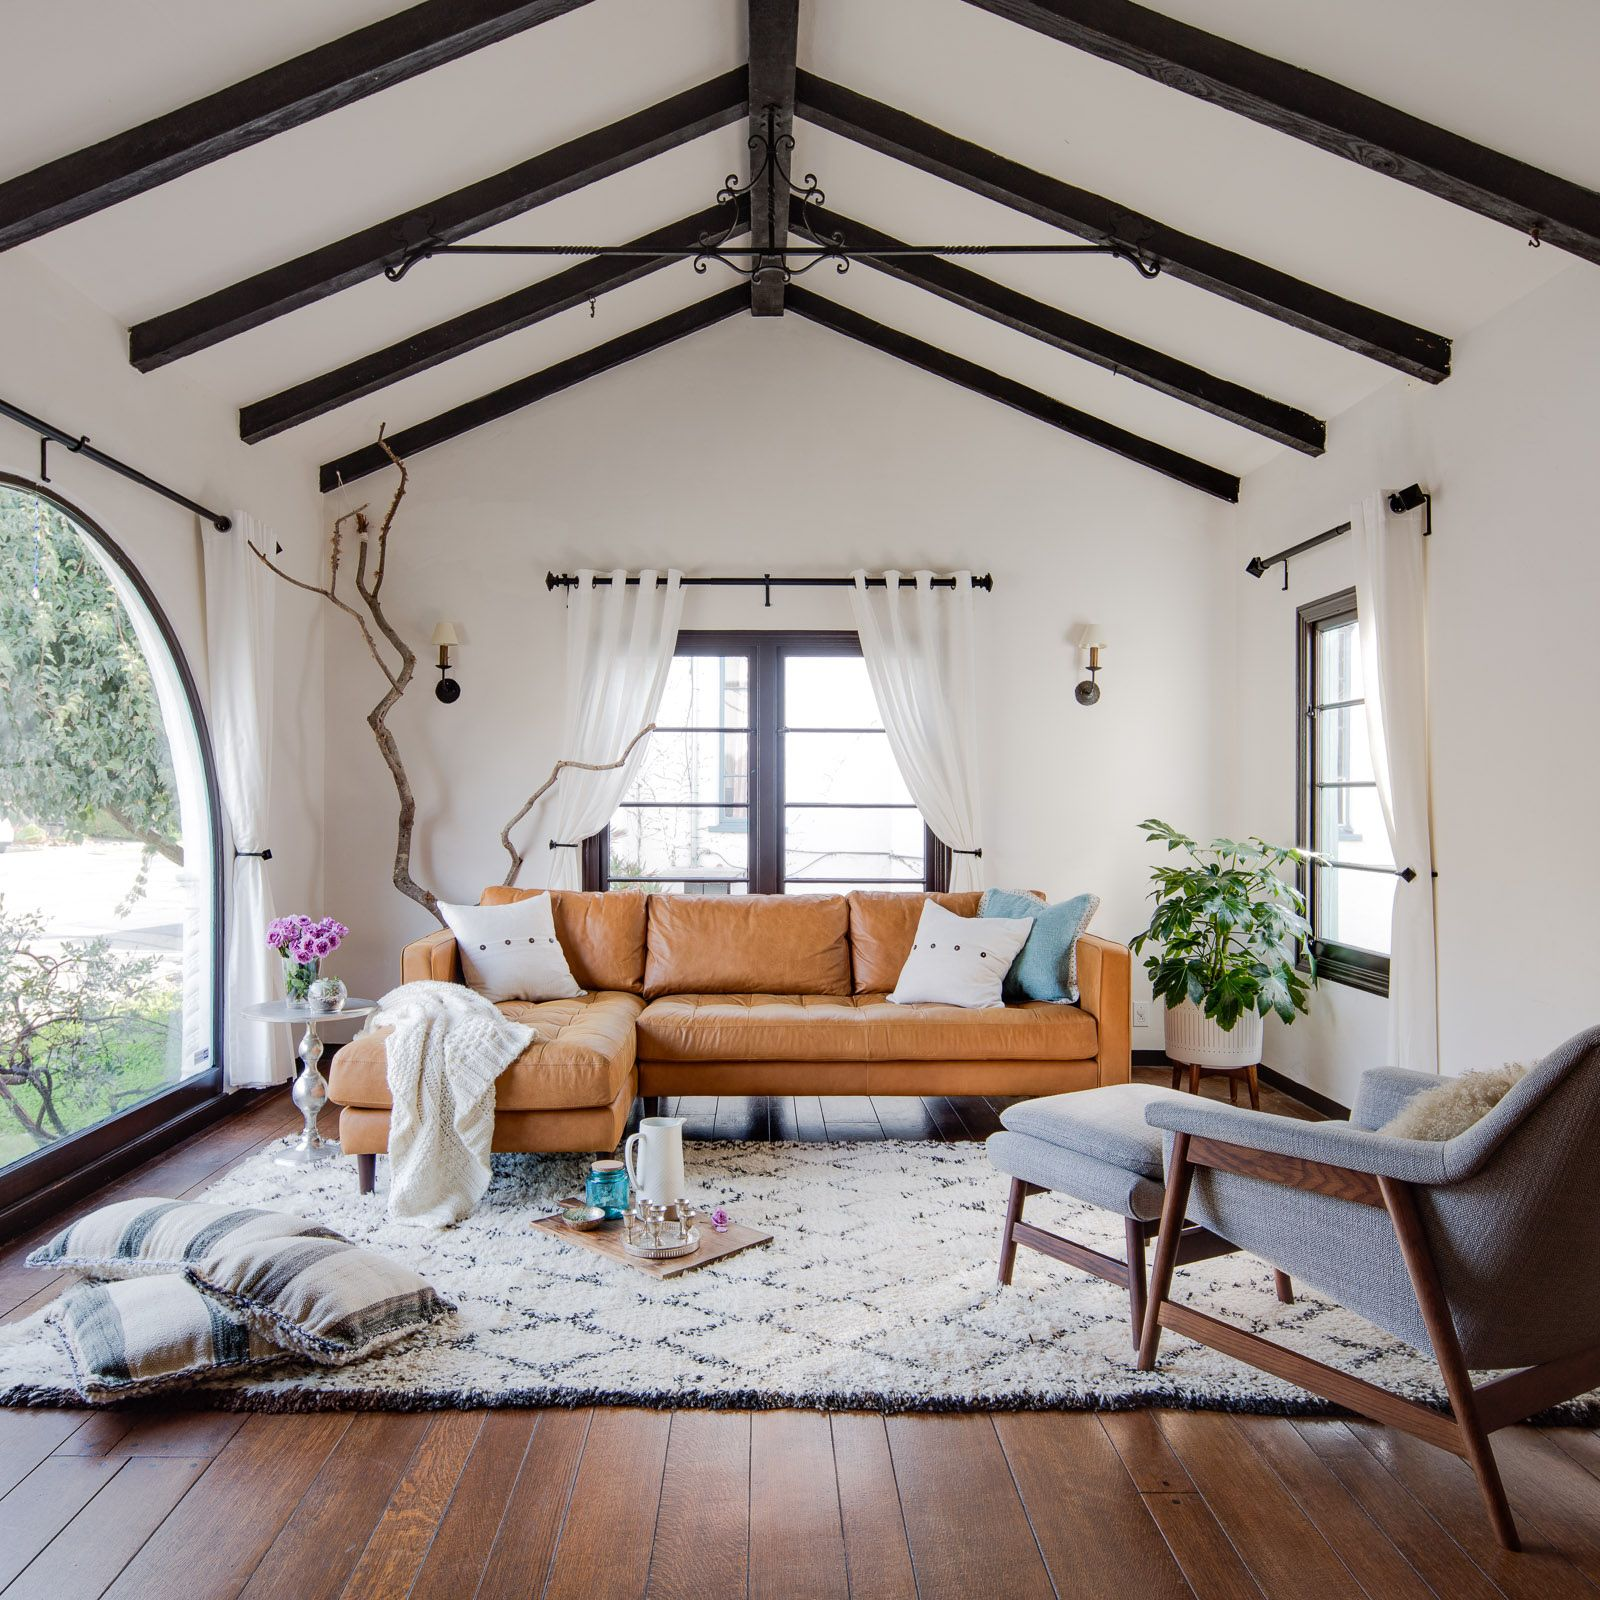 Charming Spanish Bungalow Oakland Ca Production Peerspace Spanish Living Room Spanish Bungalow Living Room Remodel #spanish #style #living #room #furniture